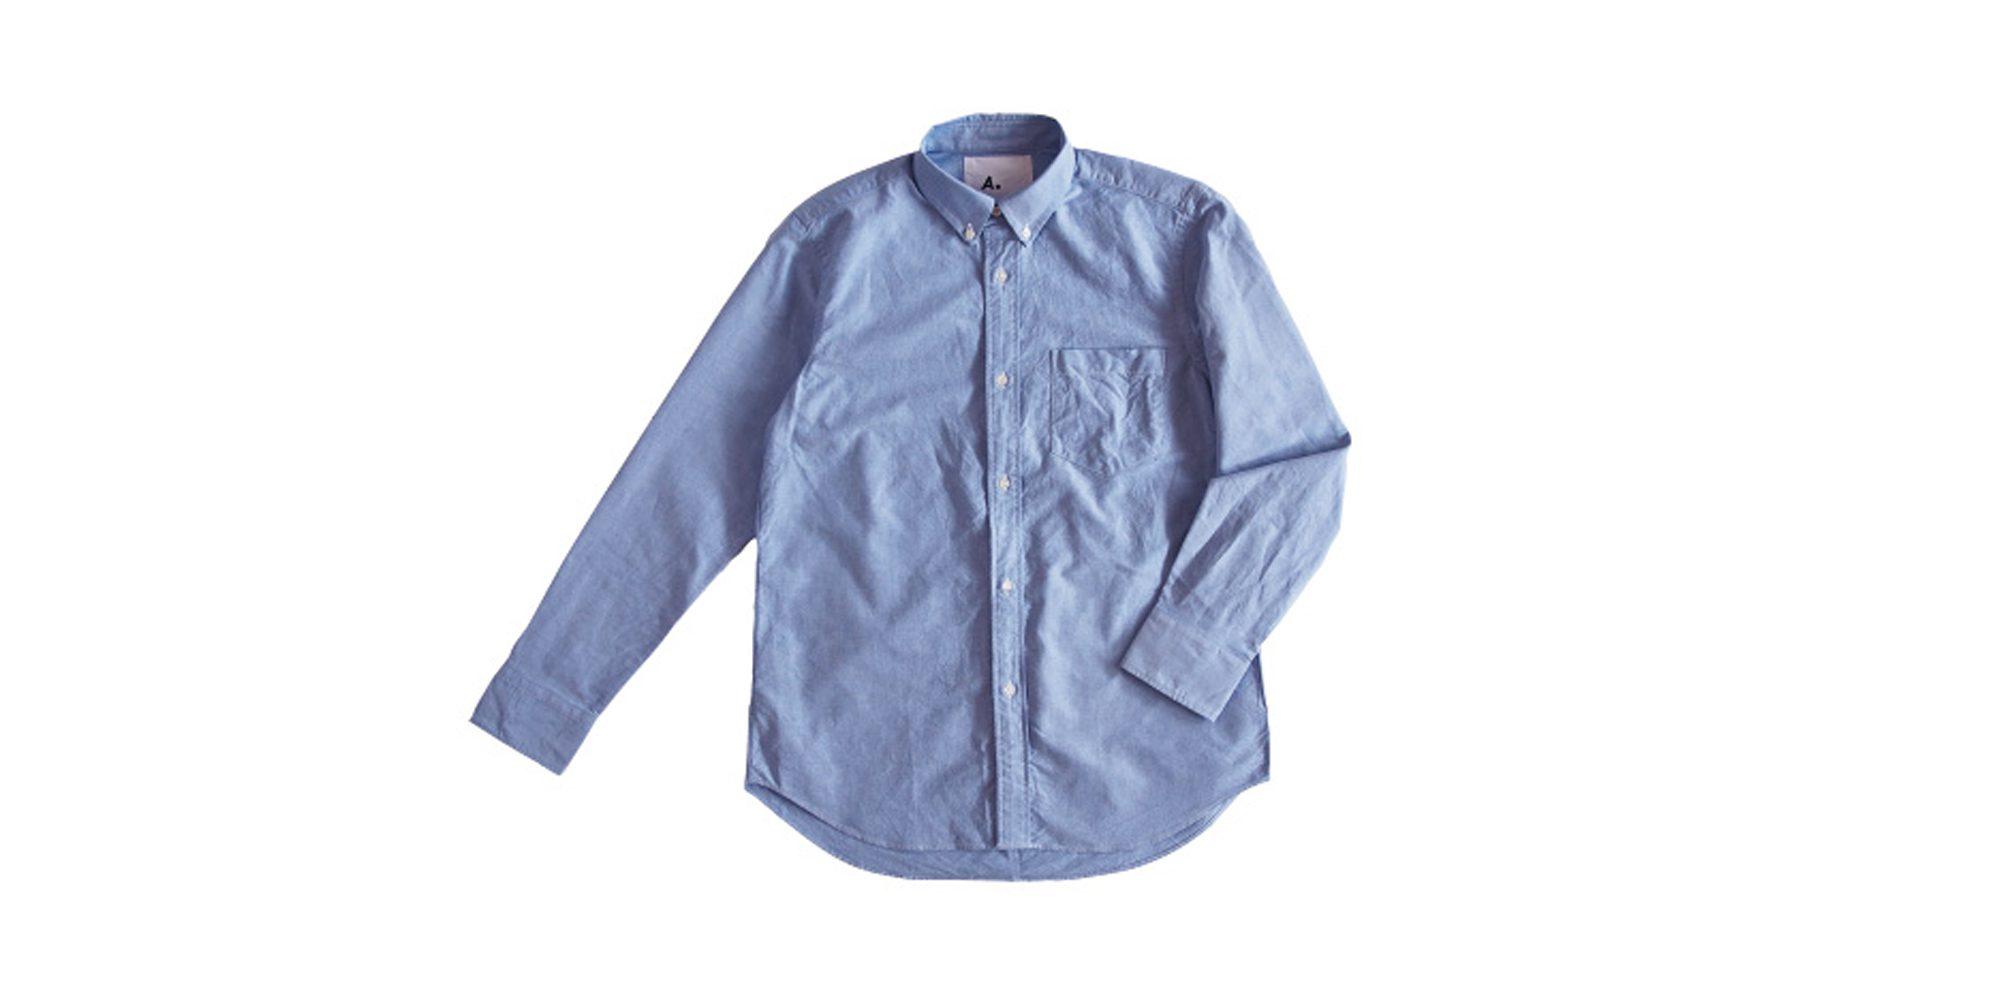 A. Men'sオックスBDシャツ